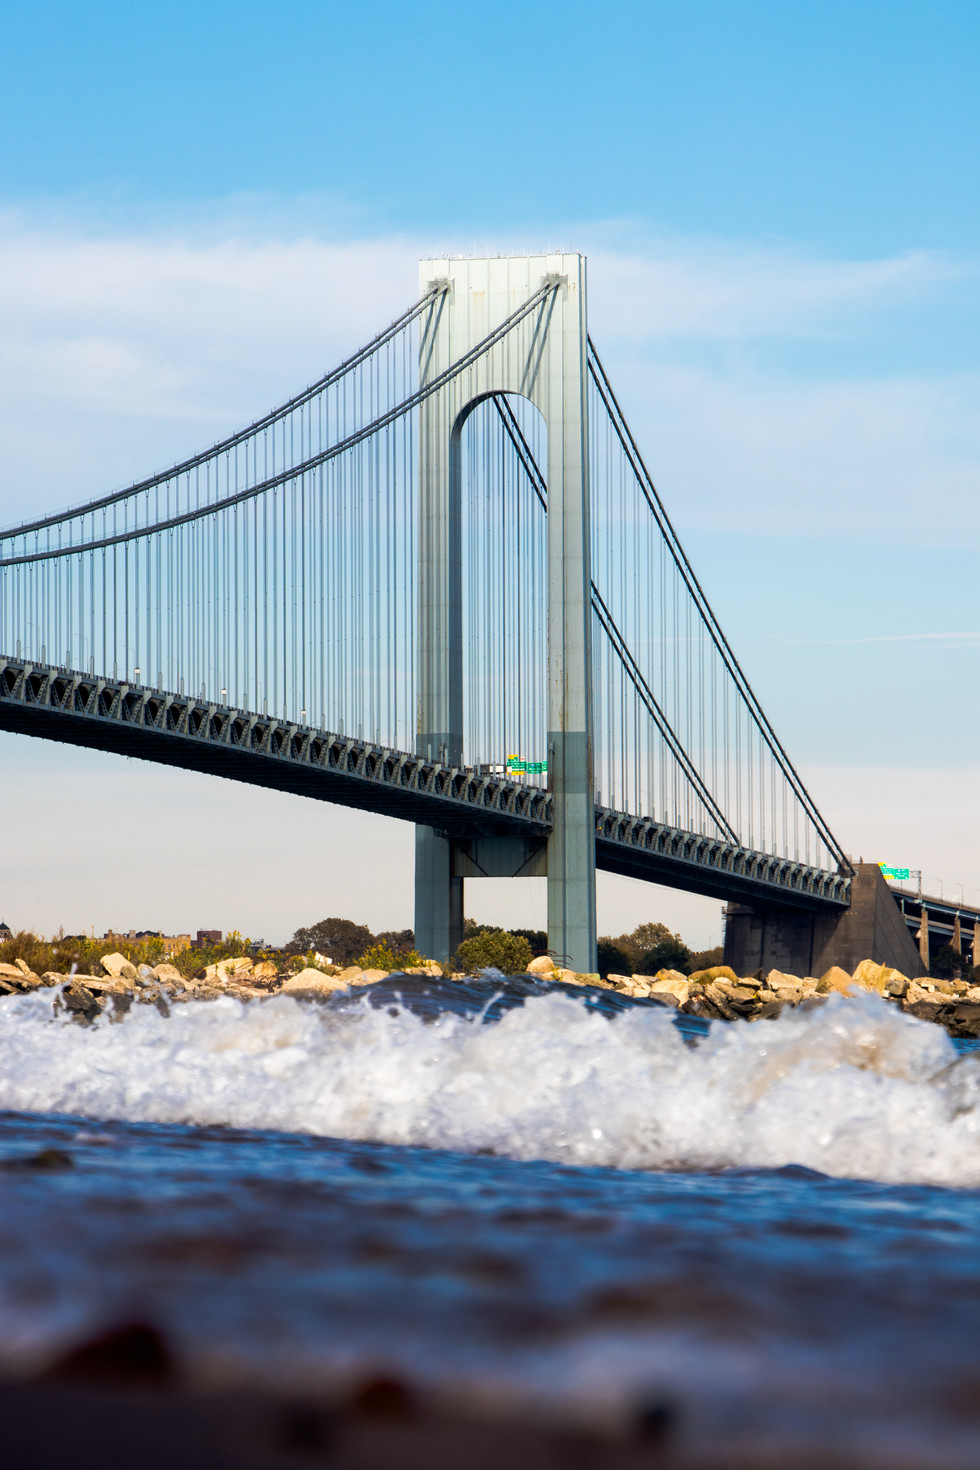 Verrazzano Bridge - New York